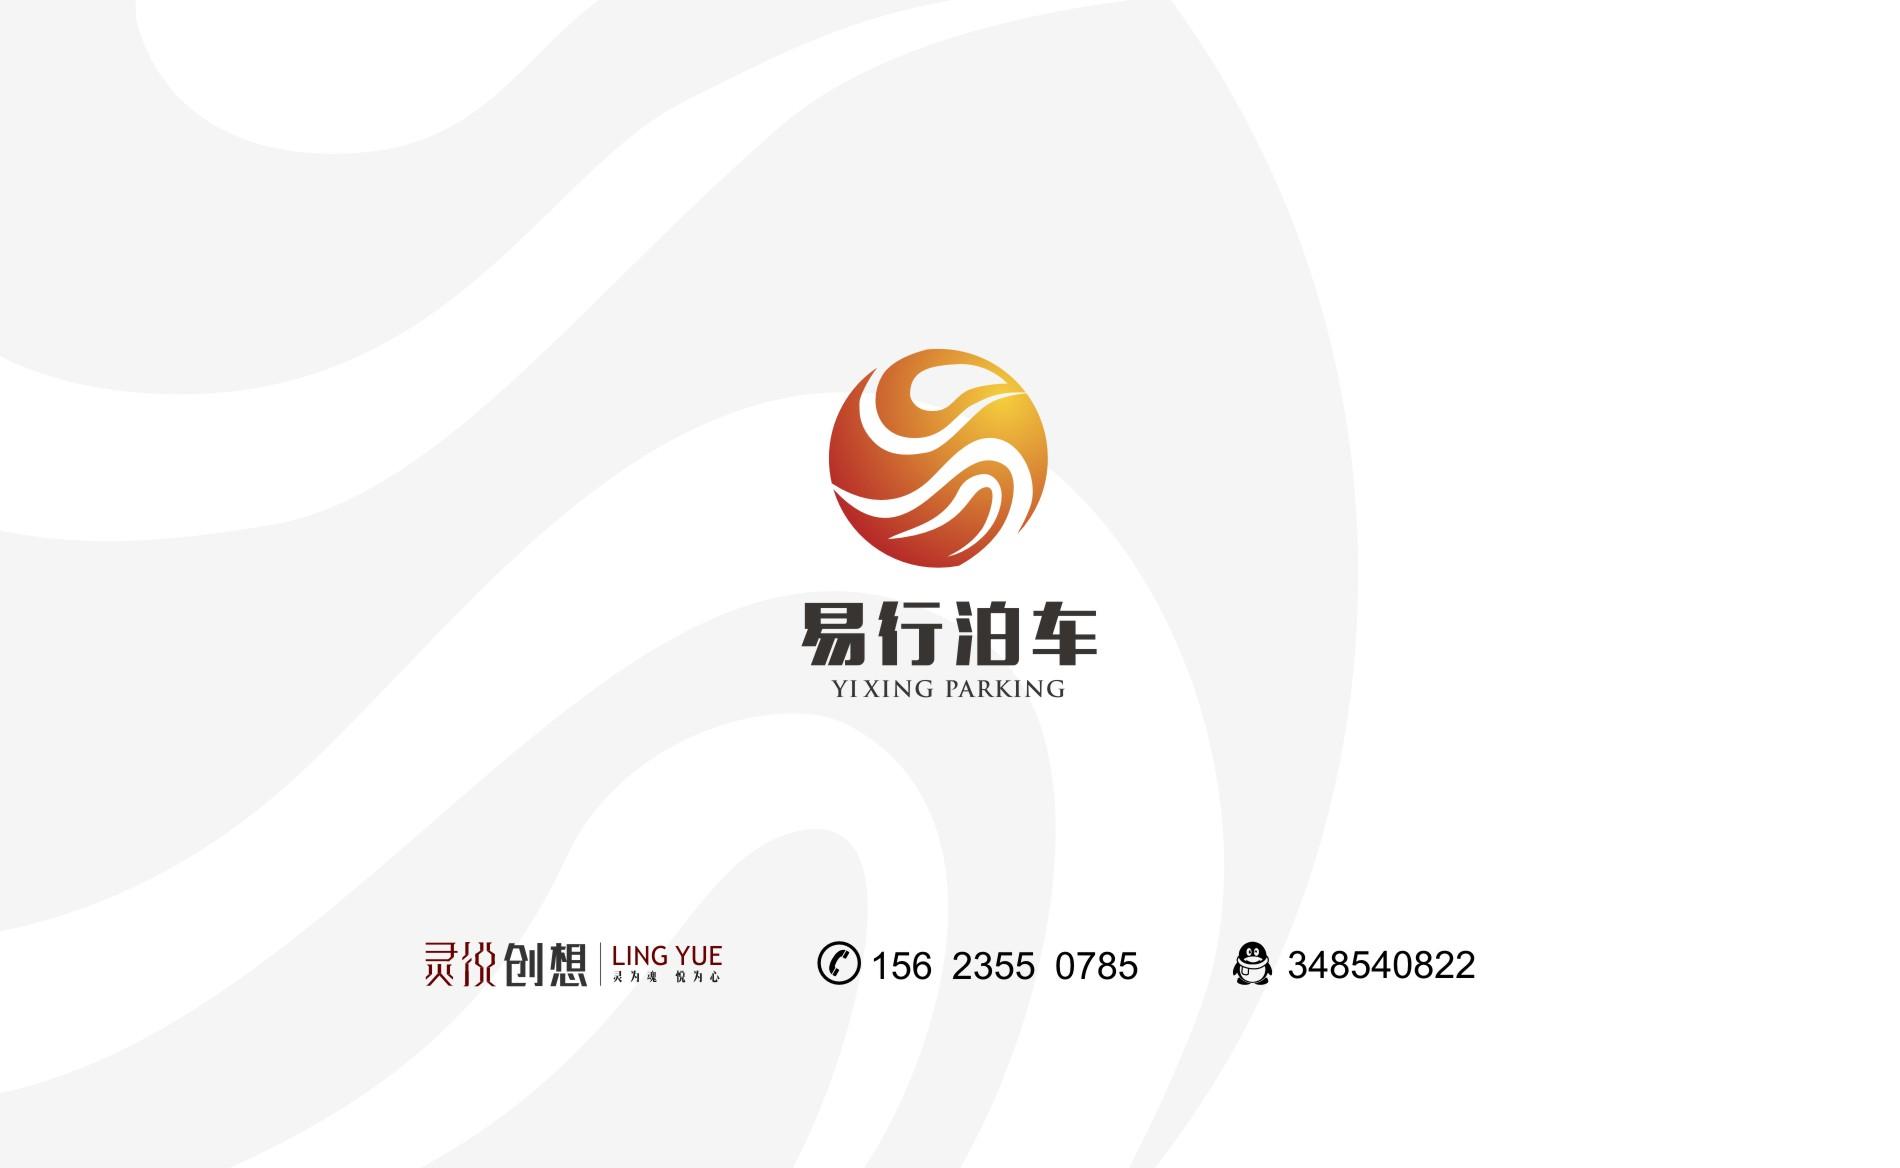 易行泊車logo